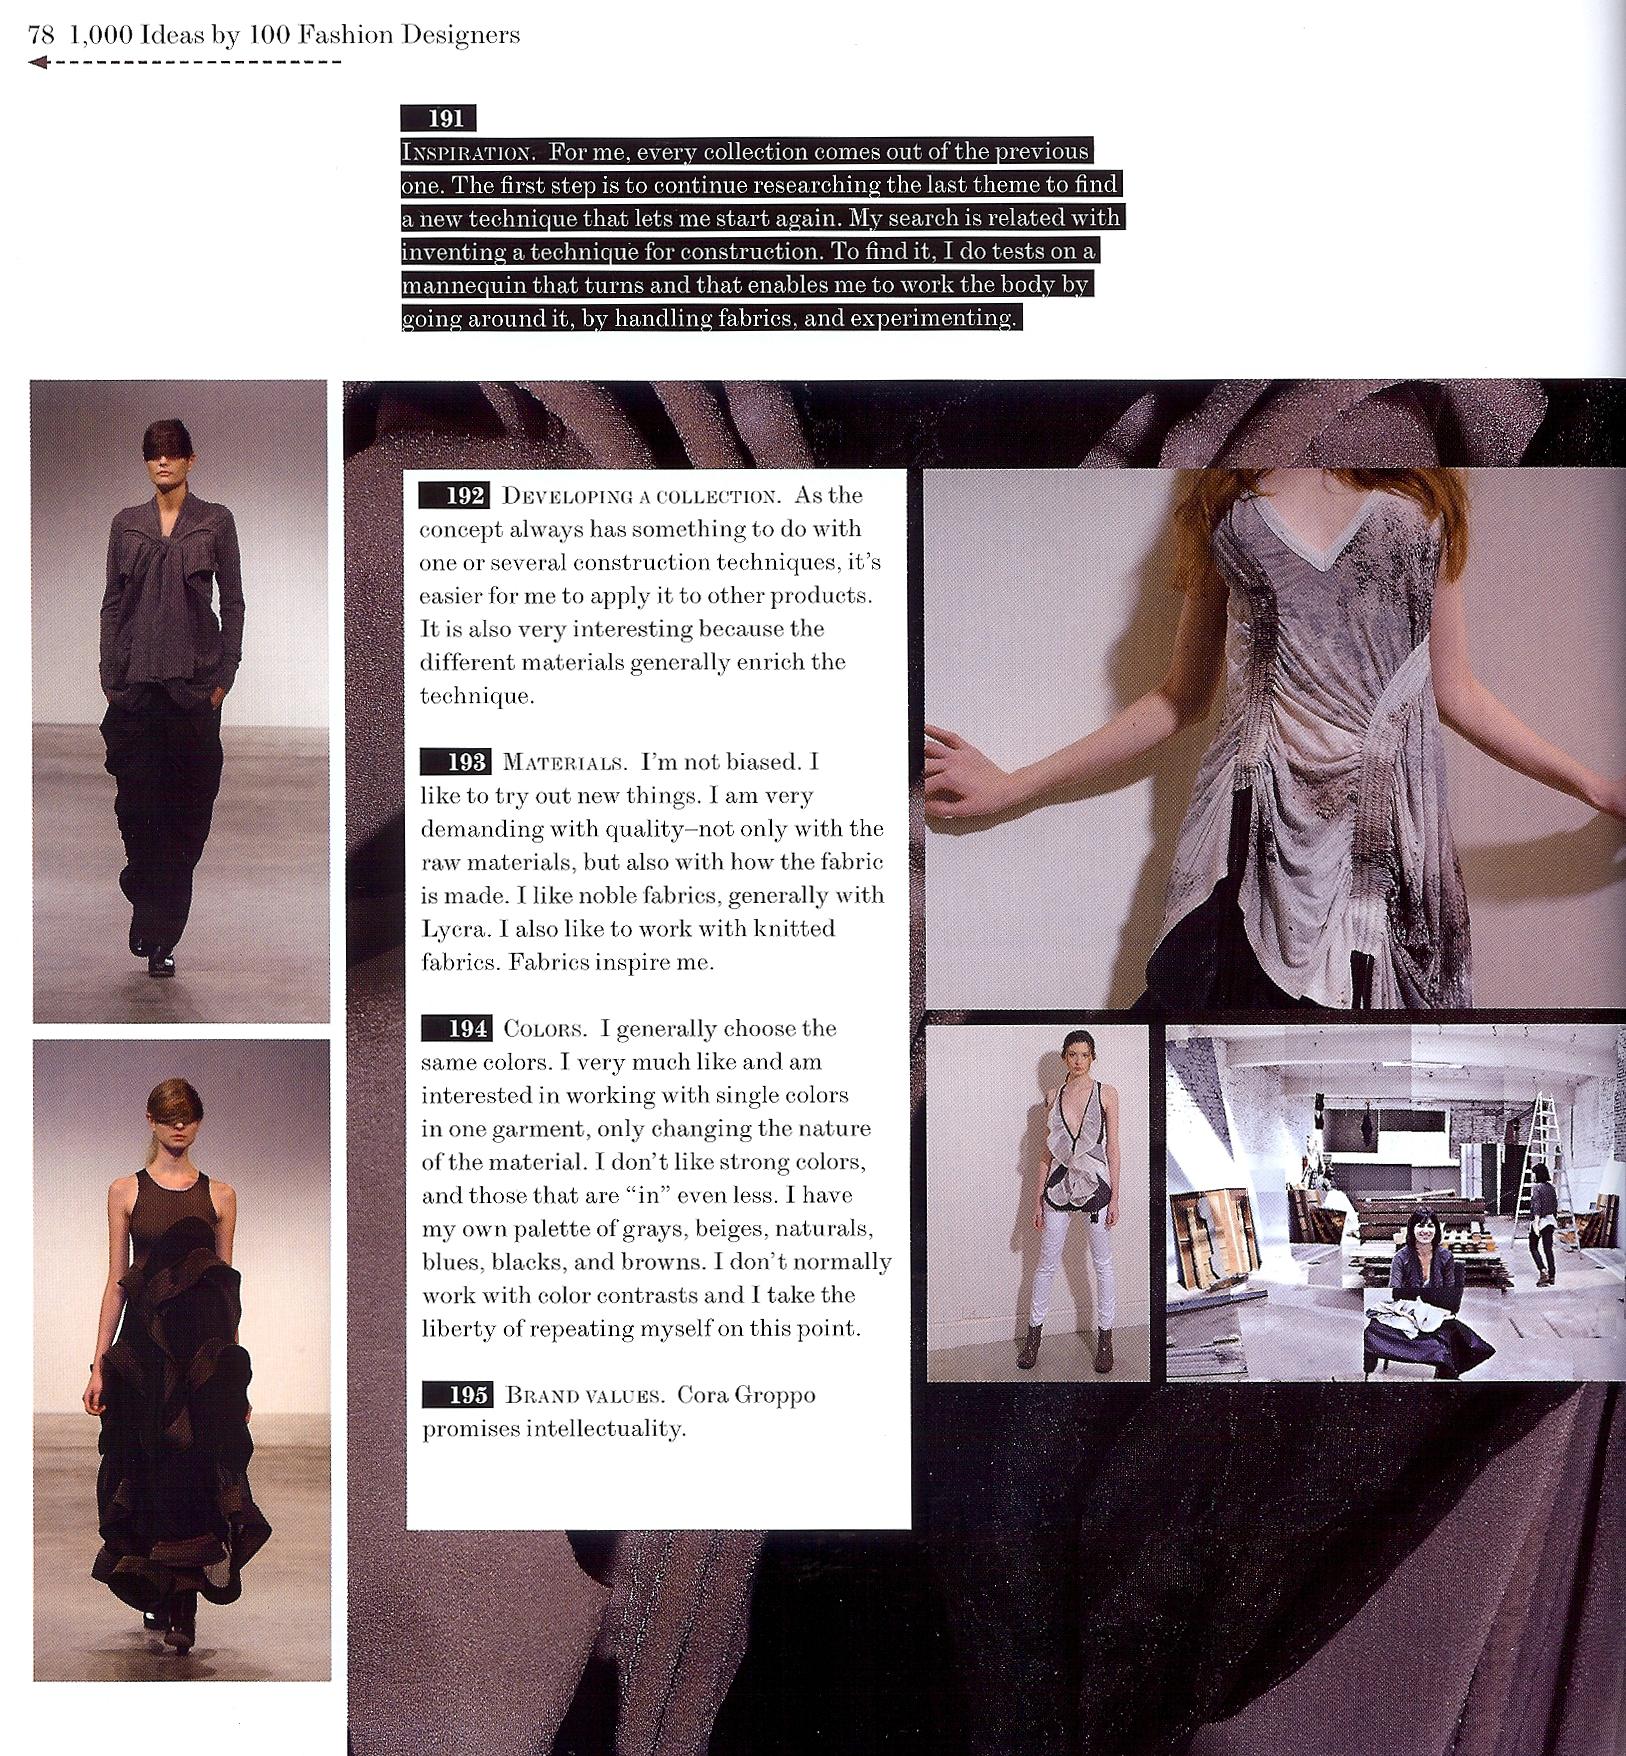 Craftside 191 195 Of 1000 Ideas By 100 Fashion Designers By Carolina Cerimedo